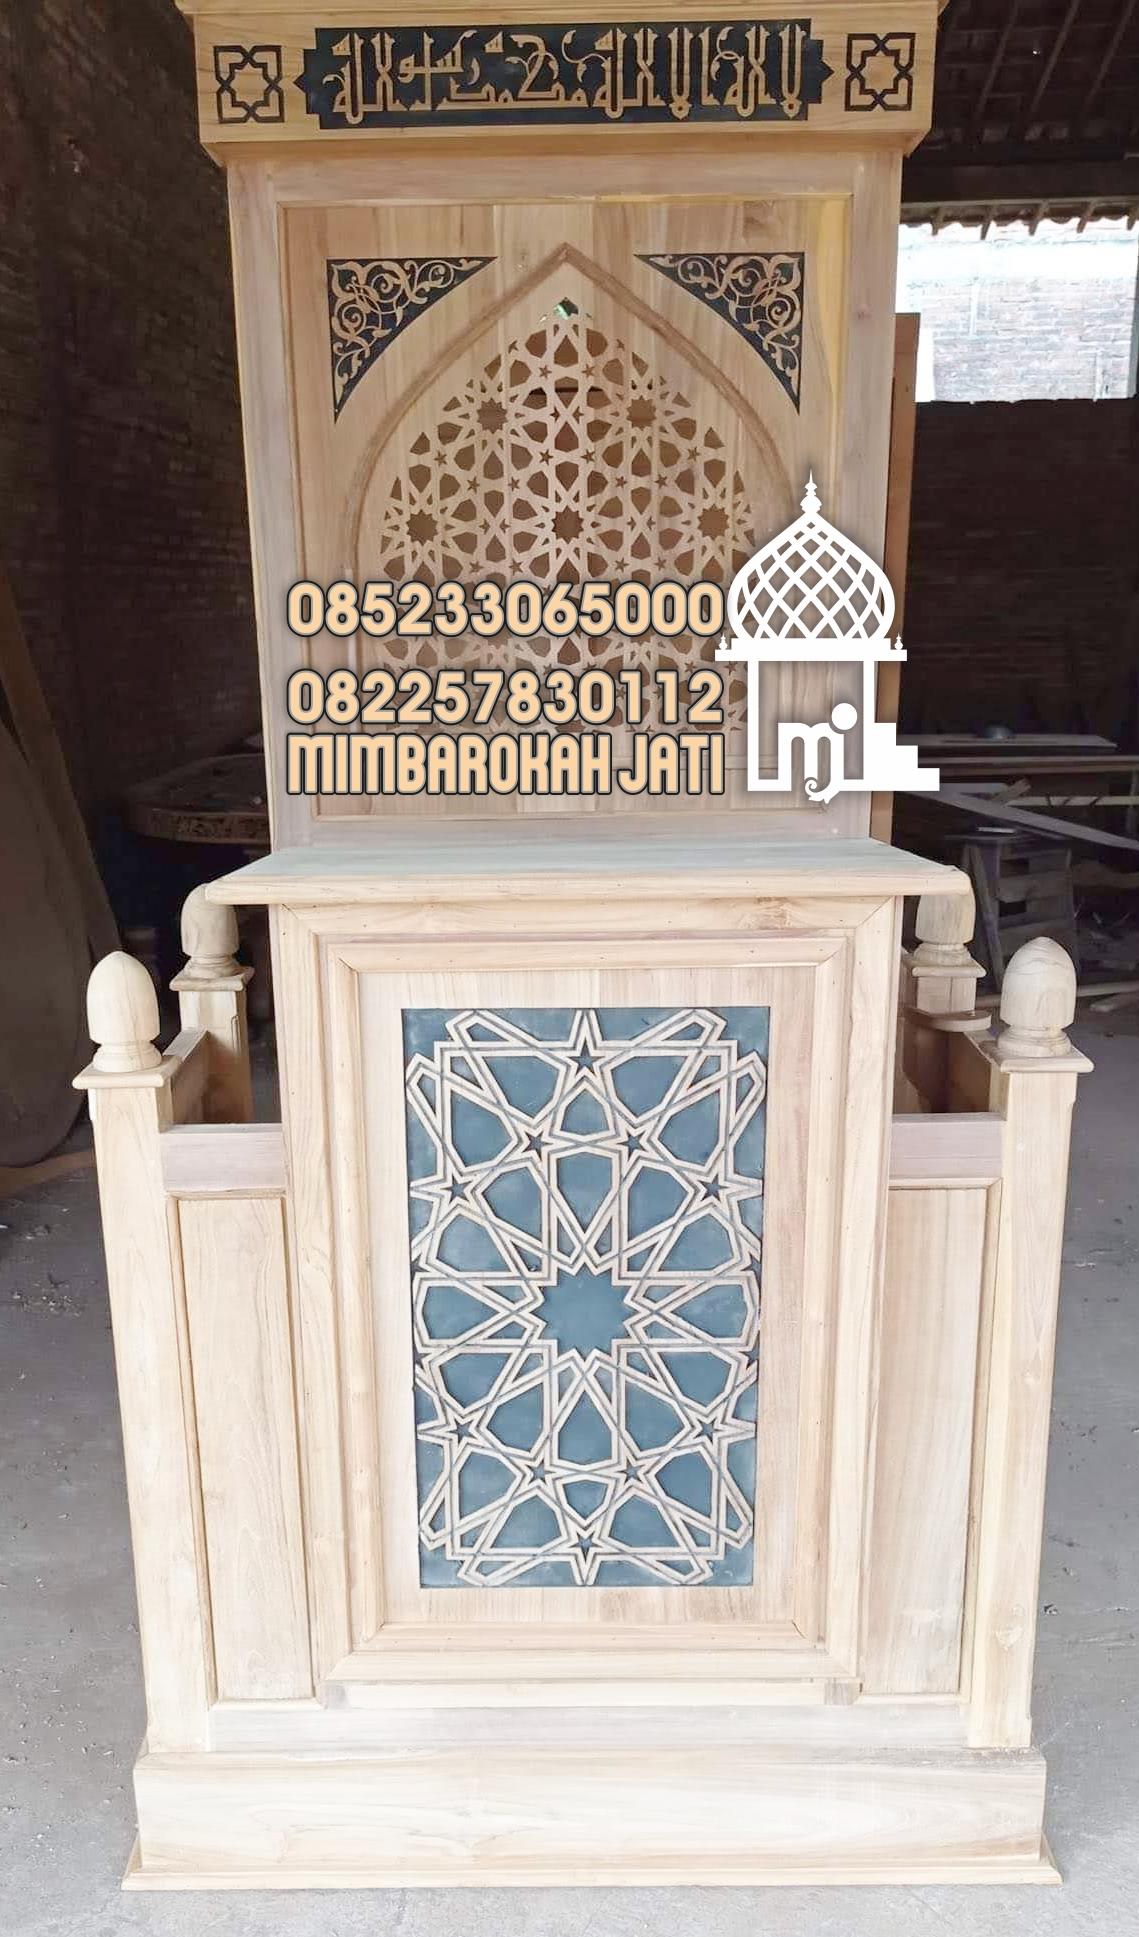 Mimbar Jati Ornamen Marocco Masjid Agung Banjarnegara